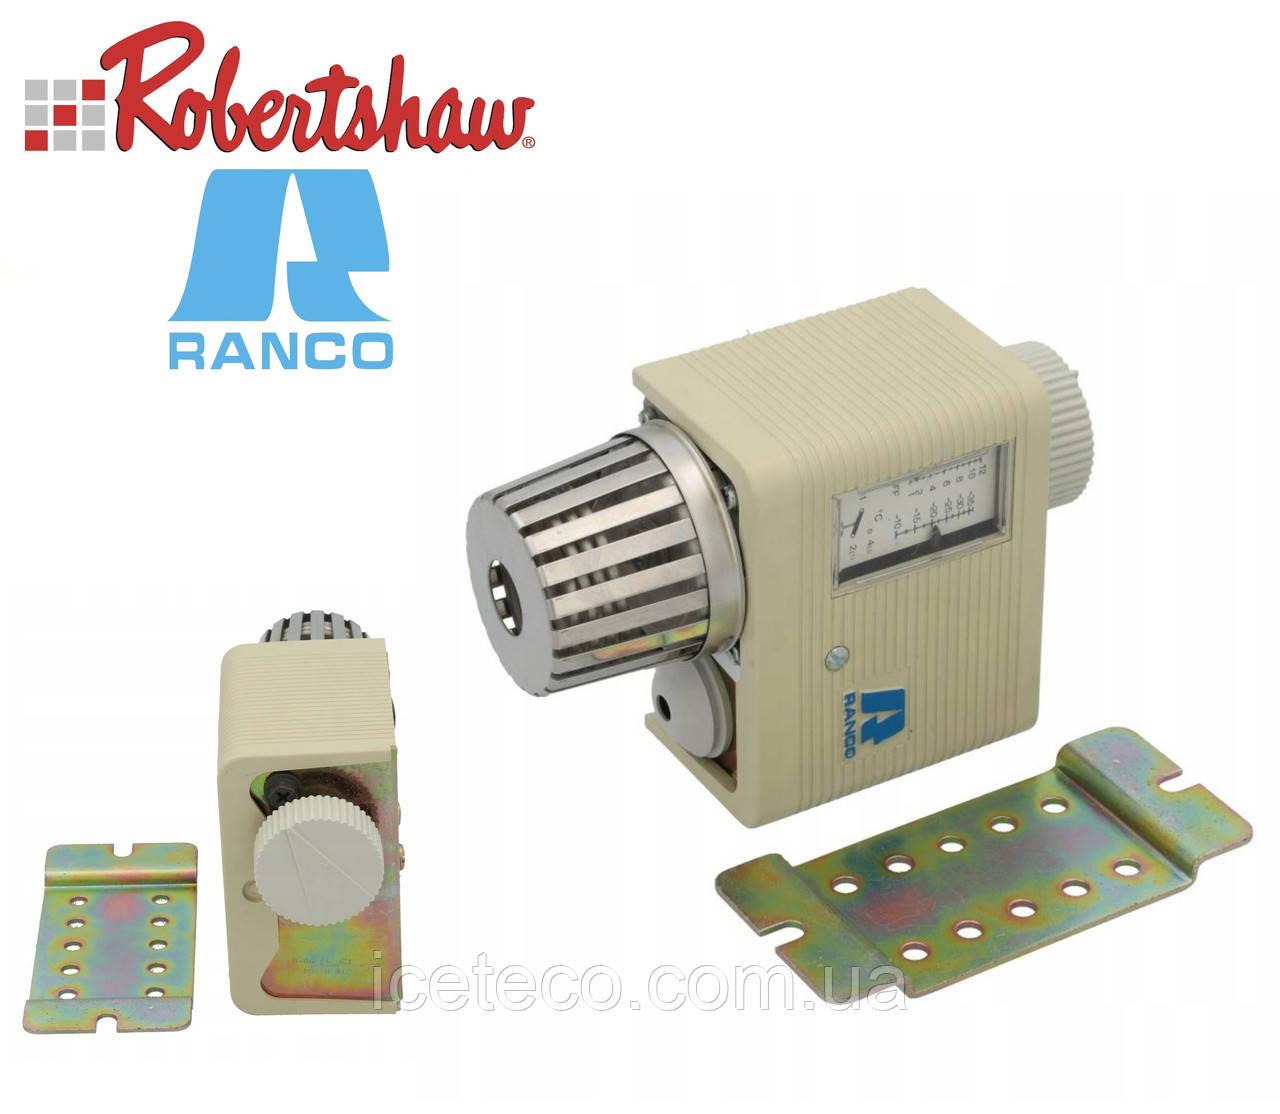 Термореле камерное для холодильника O16-H6904 Robertshaw (Ranco)